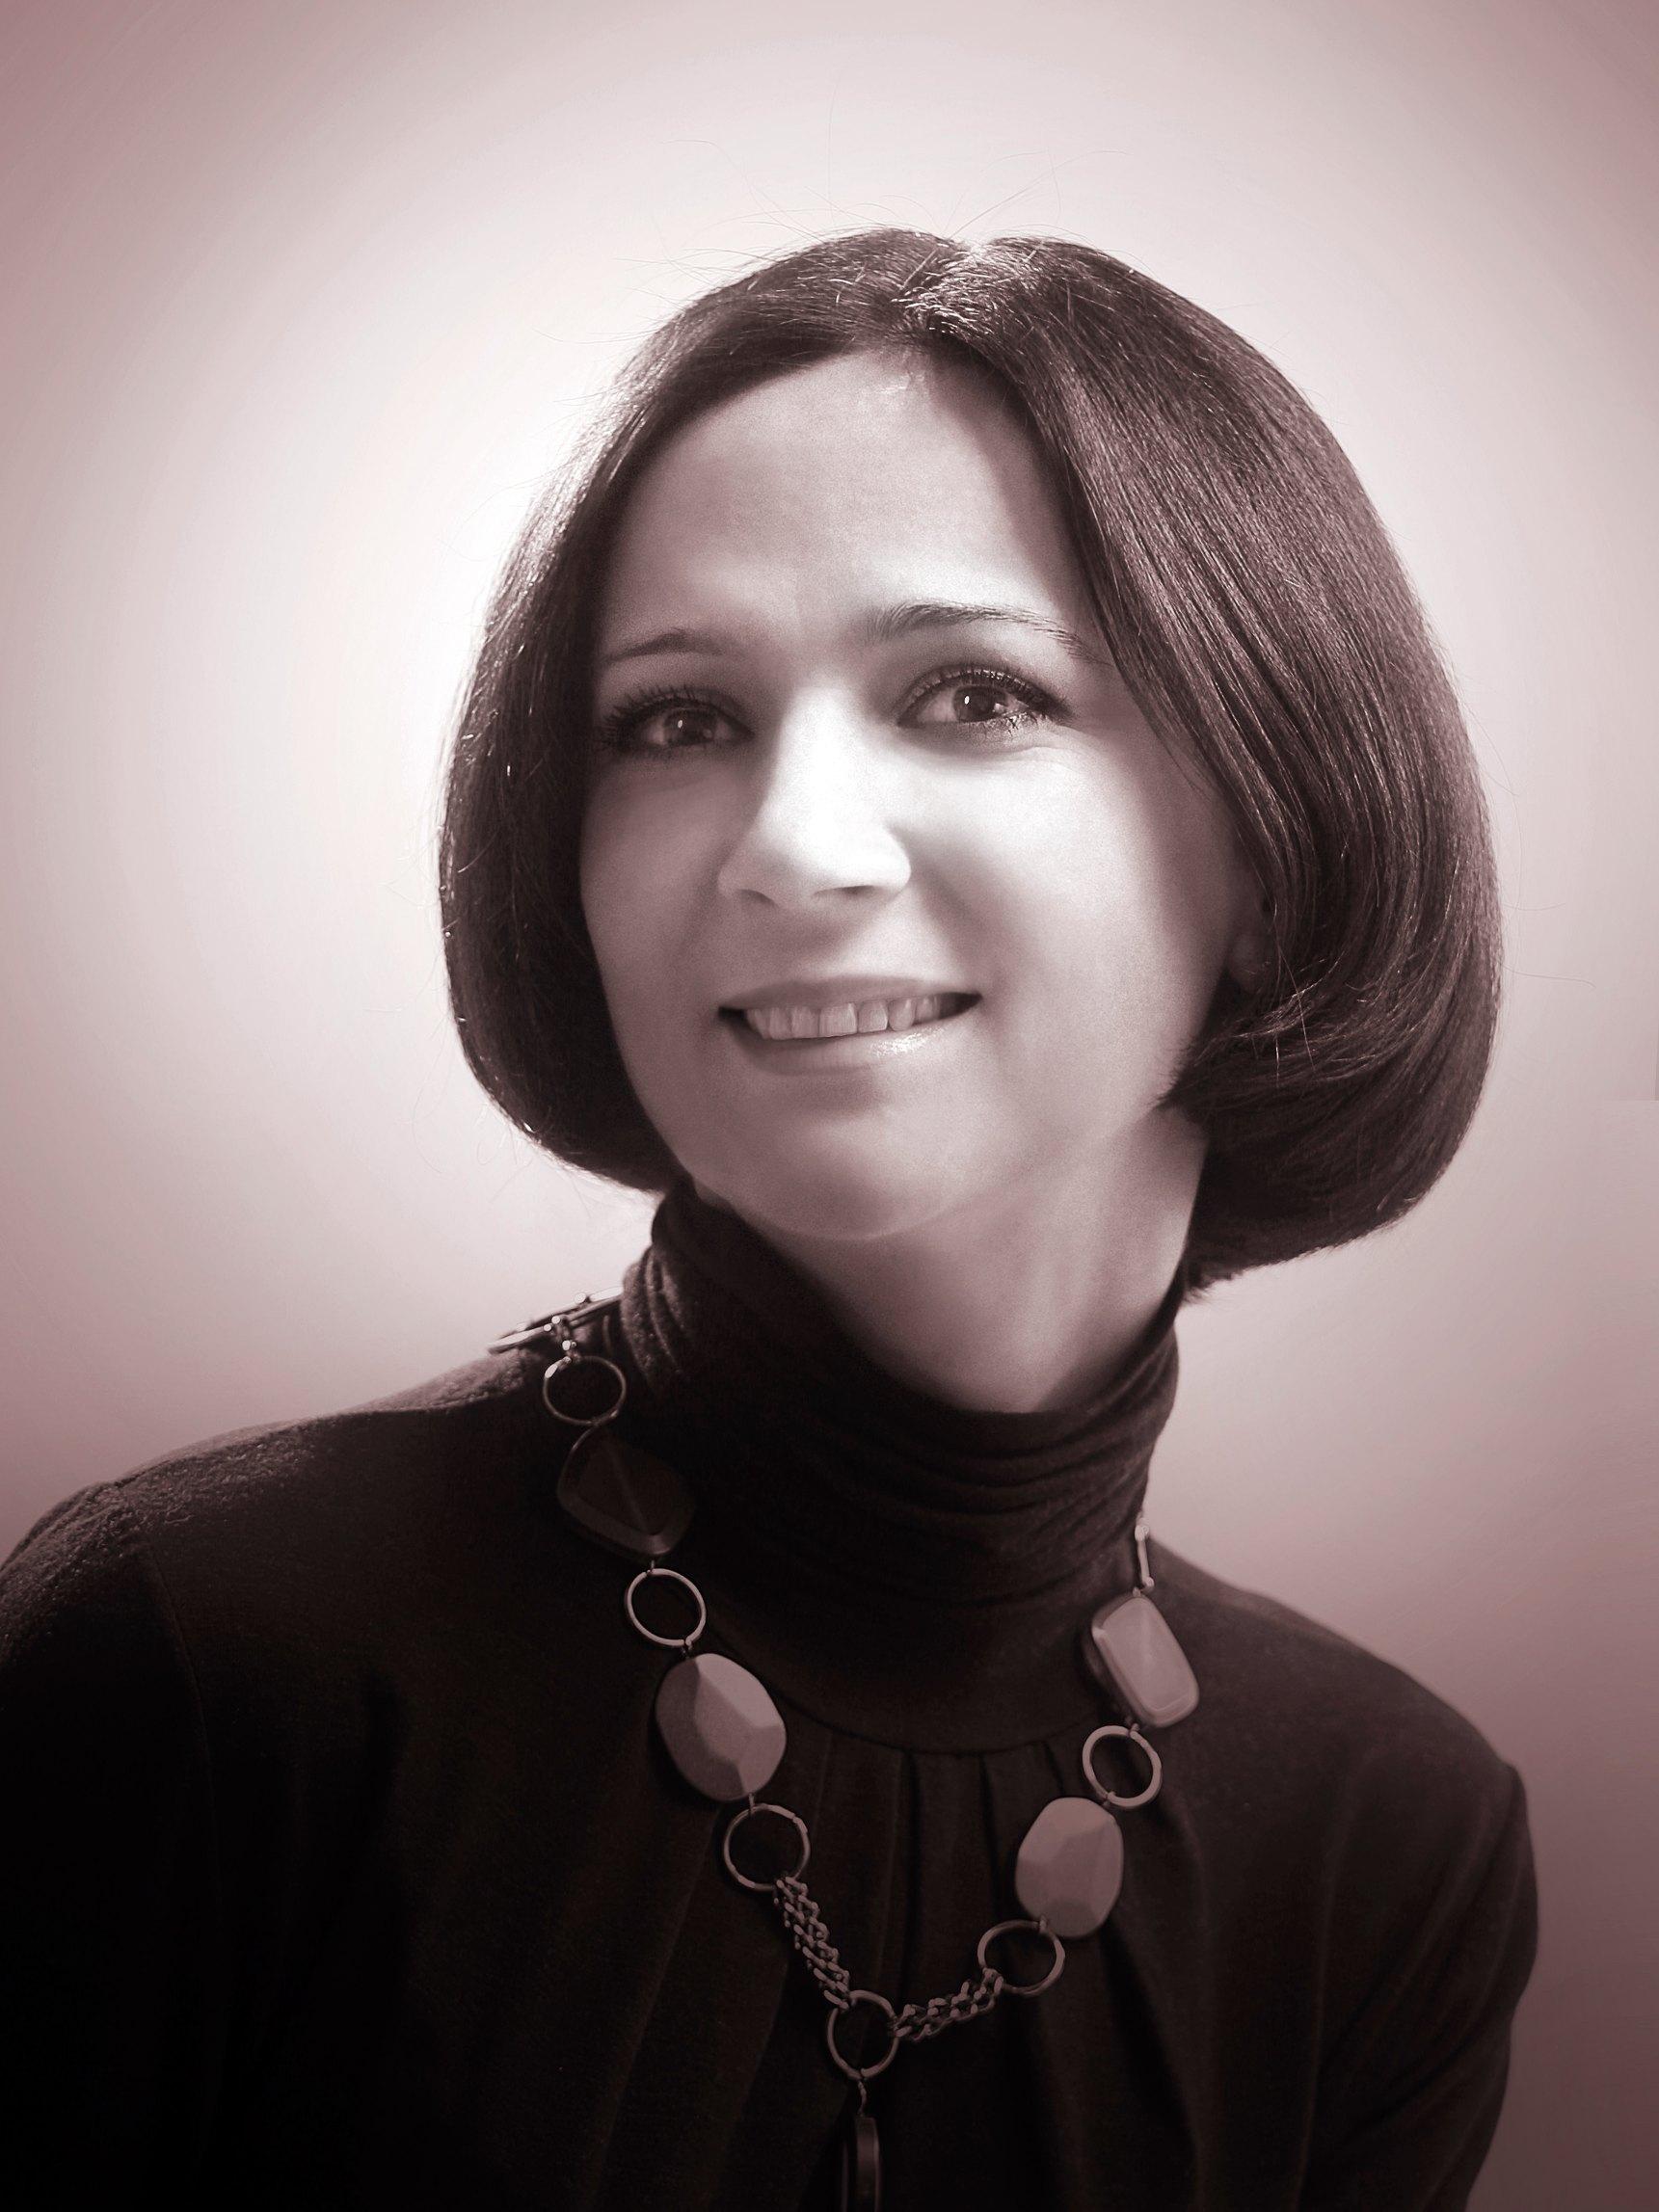 Бирюкова Ирина Владимировна